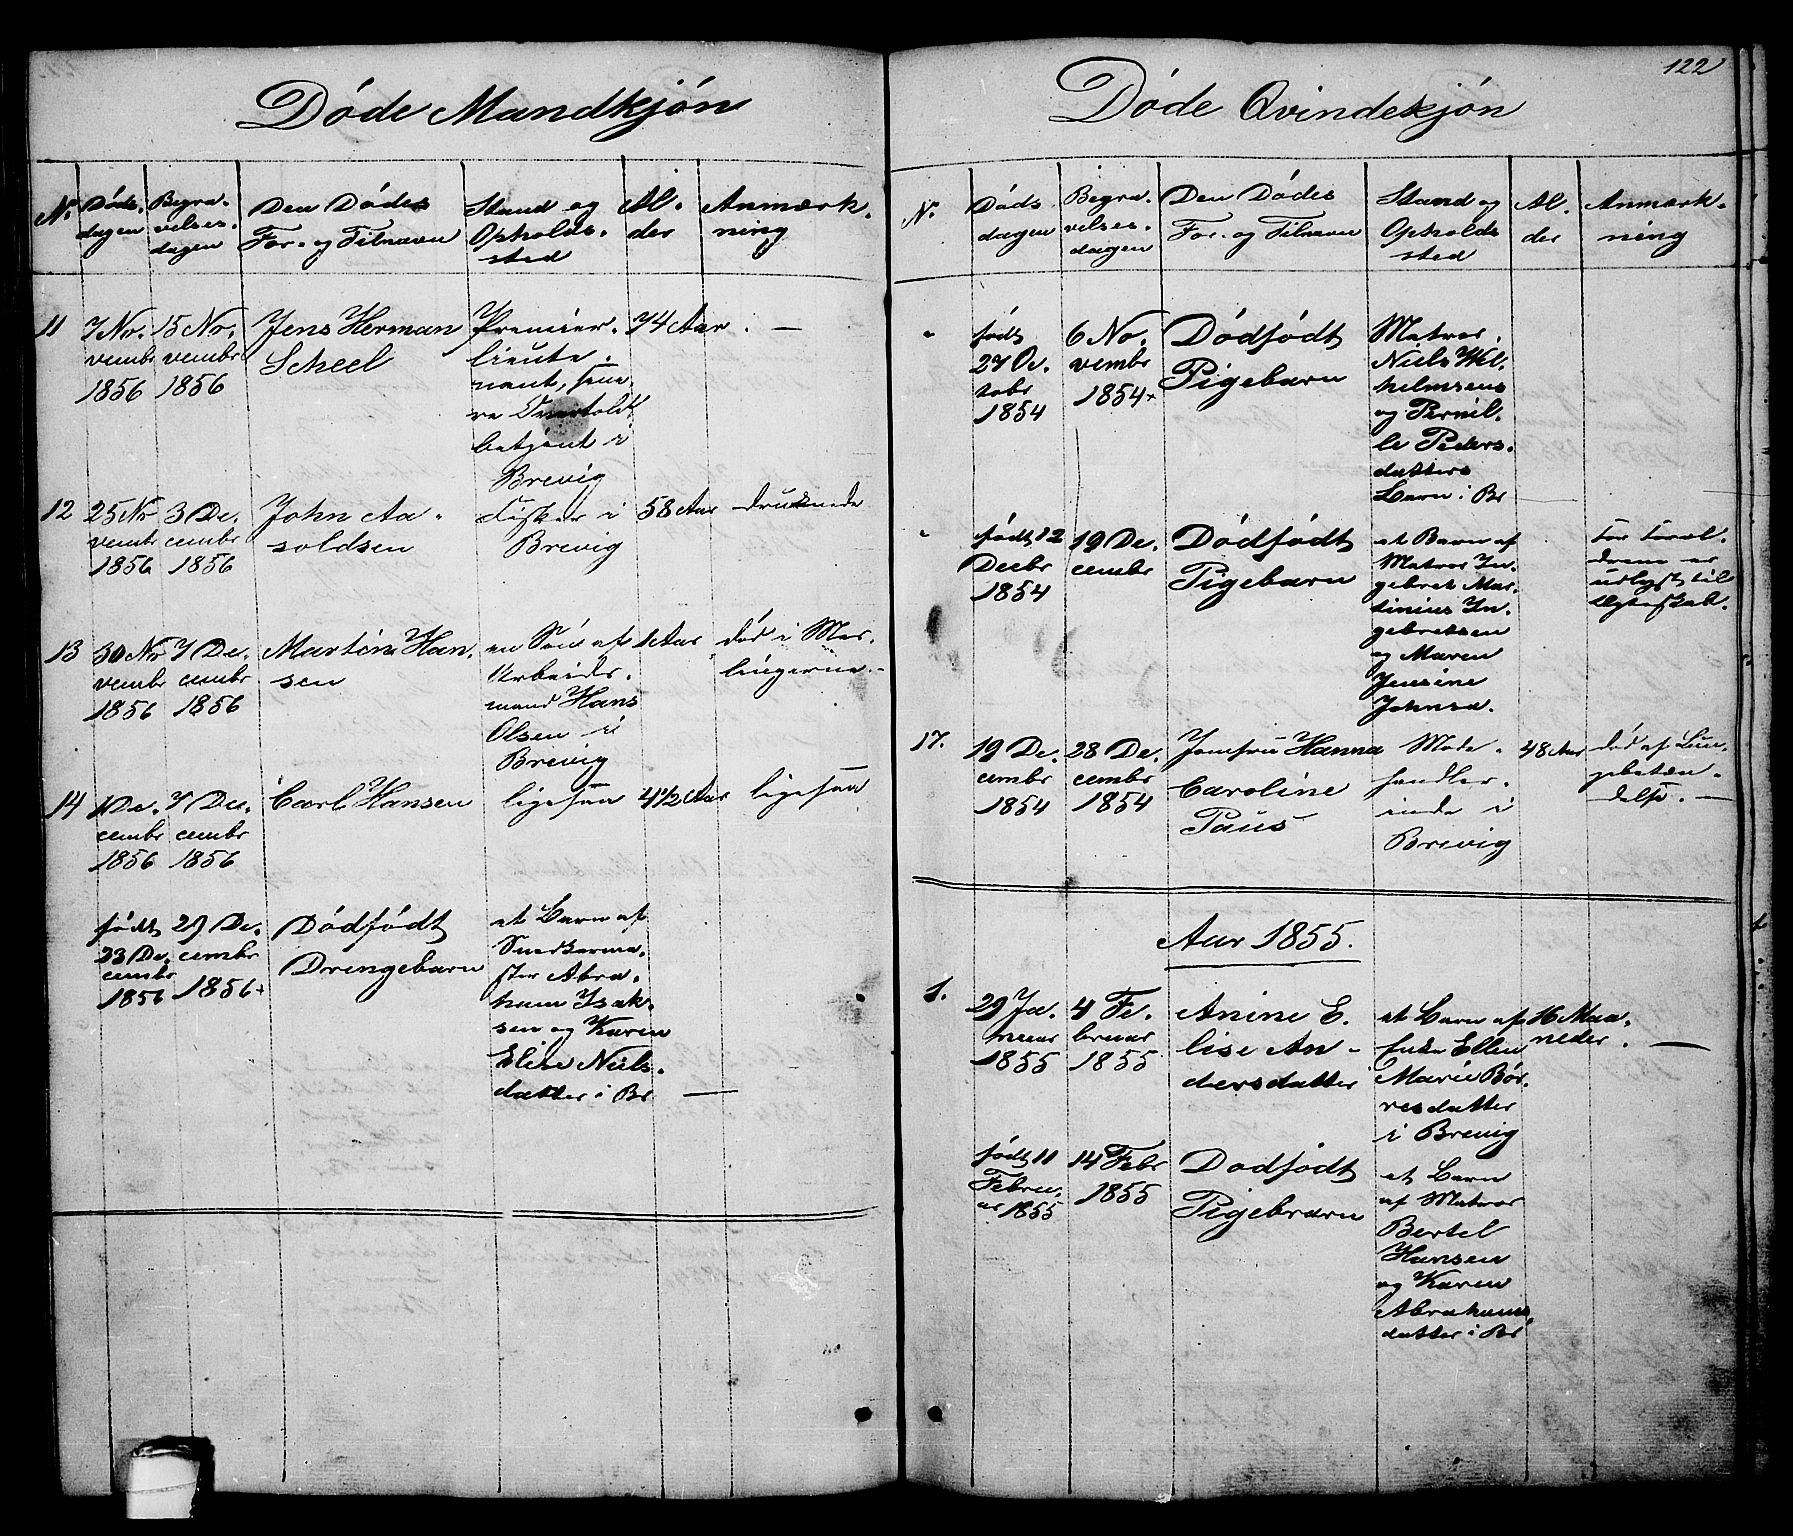 SAKO, Brevik kirkebøker, G/Ga/L0002: Klokkerbok nr. 2, 1846-1865, s. 122